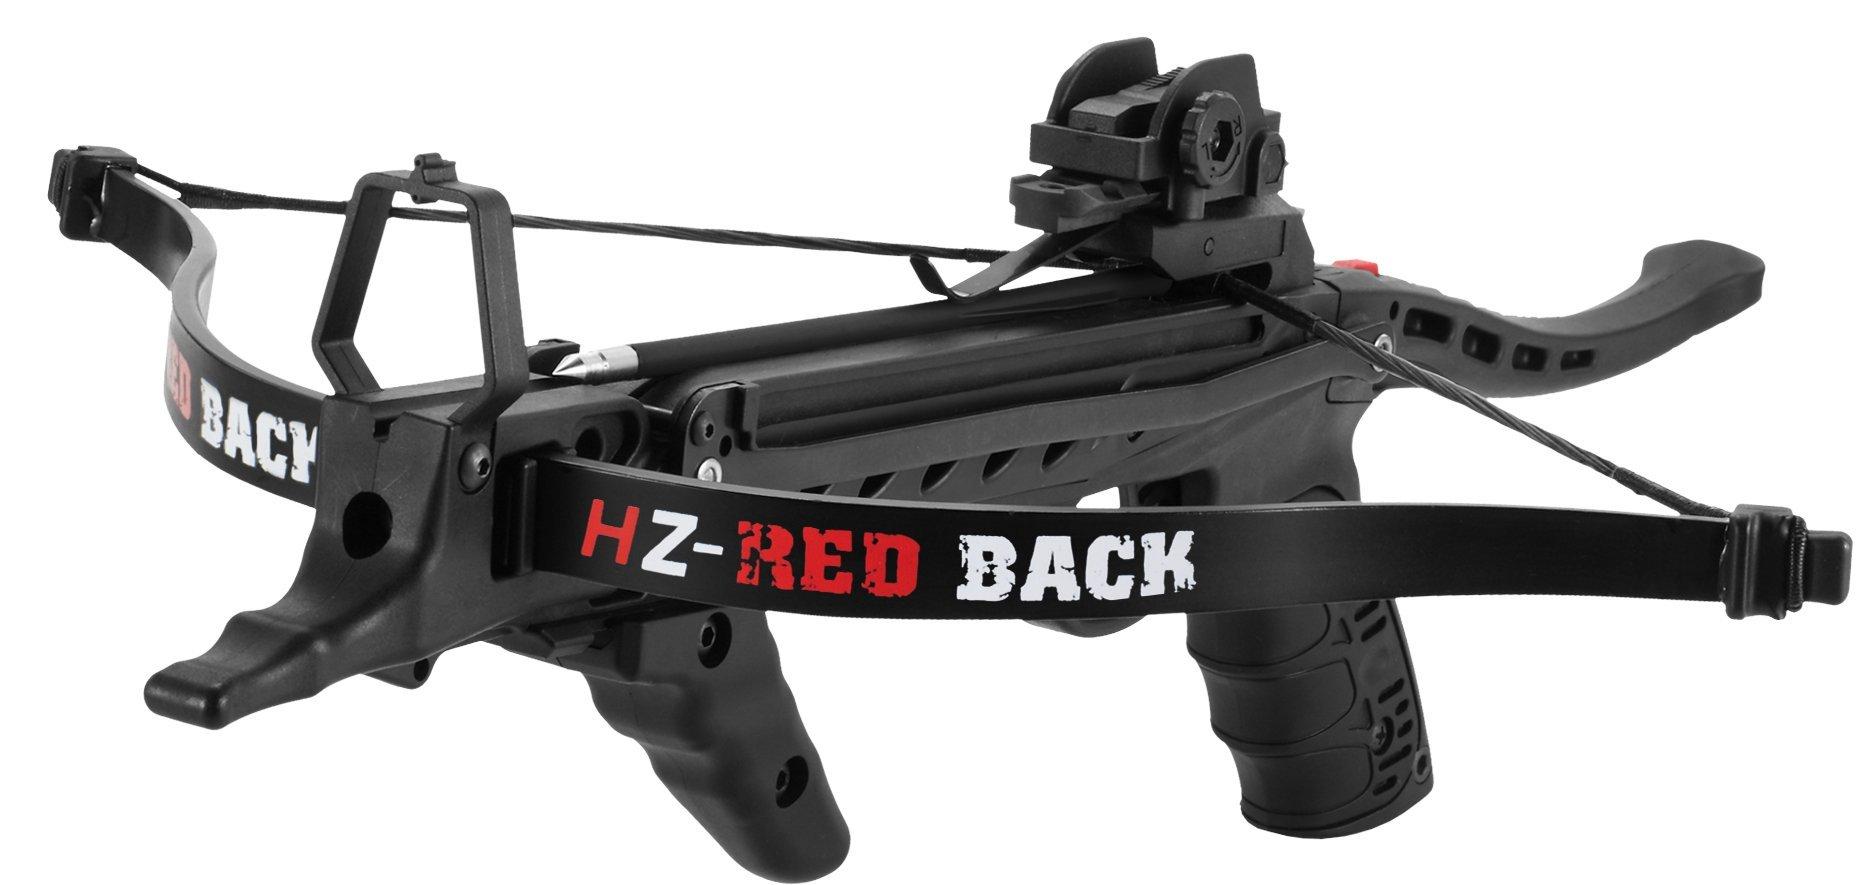 Hori-Zone Redback Armbrust SET 80lbs Single / Identitäts- und Altersprüfung durch DHL: +1.90 EUR